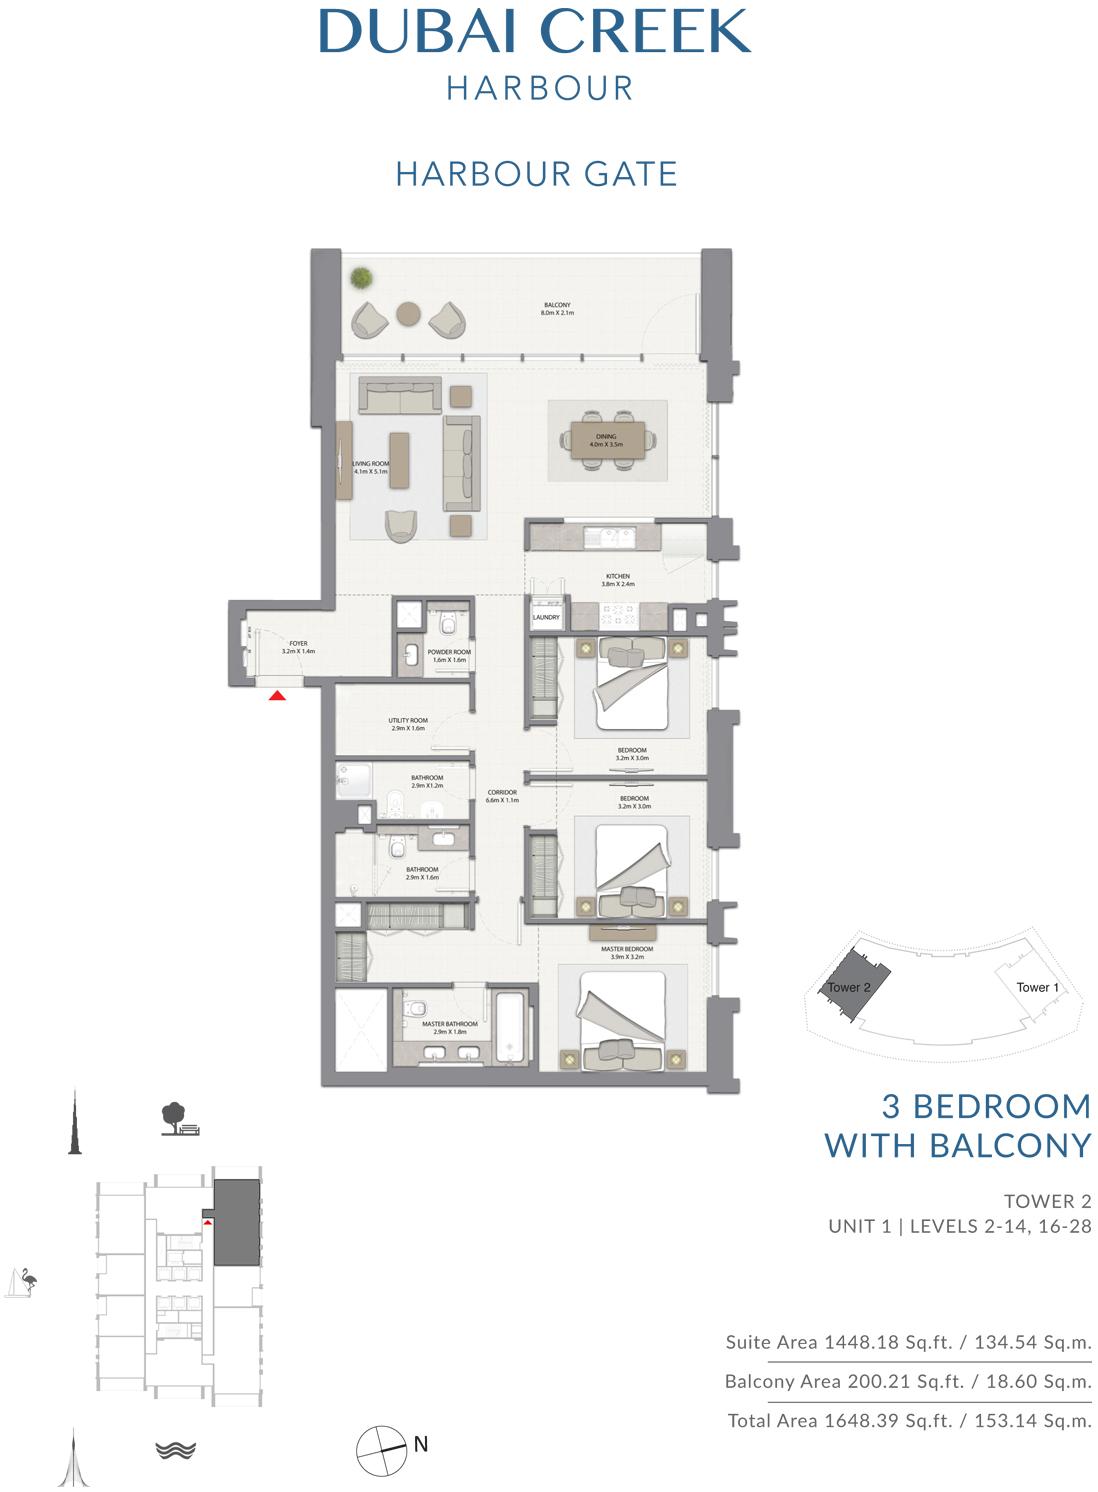 3 Bedroom With Balcony